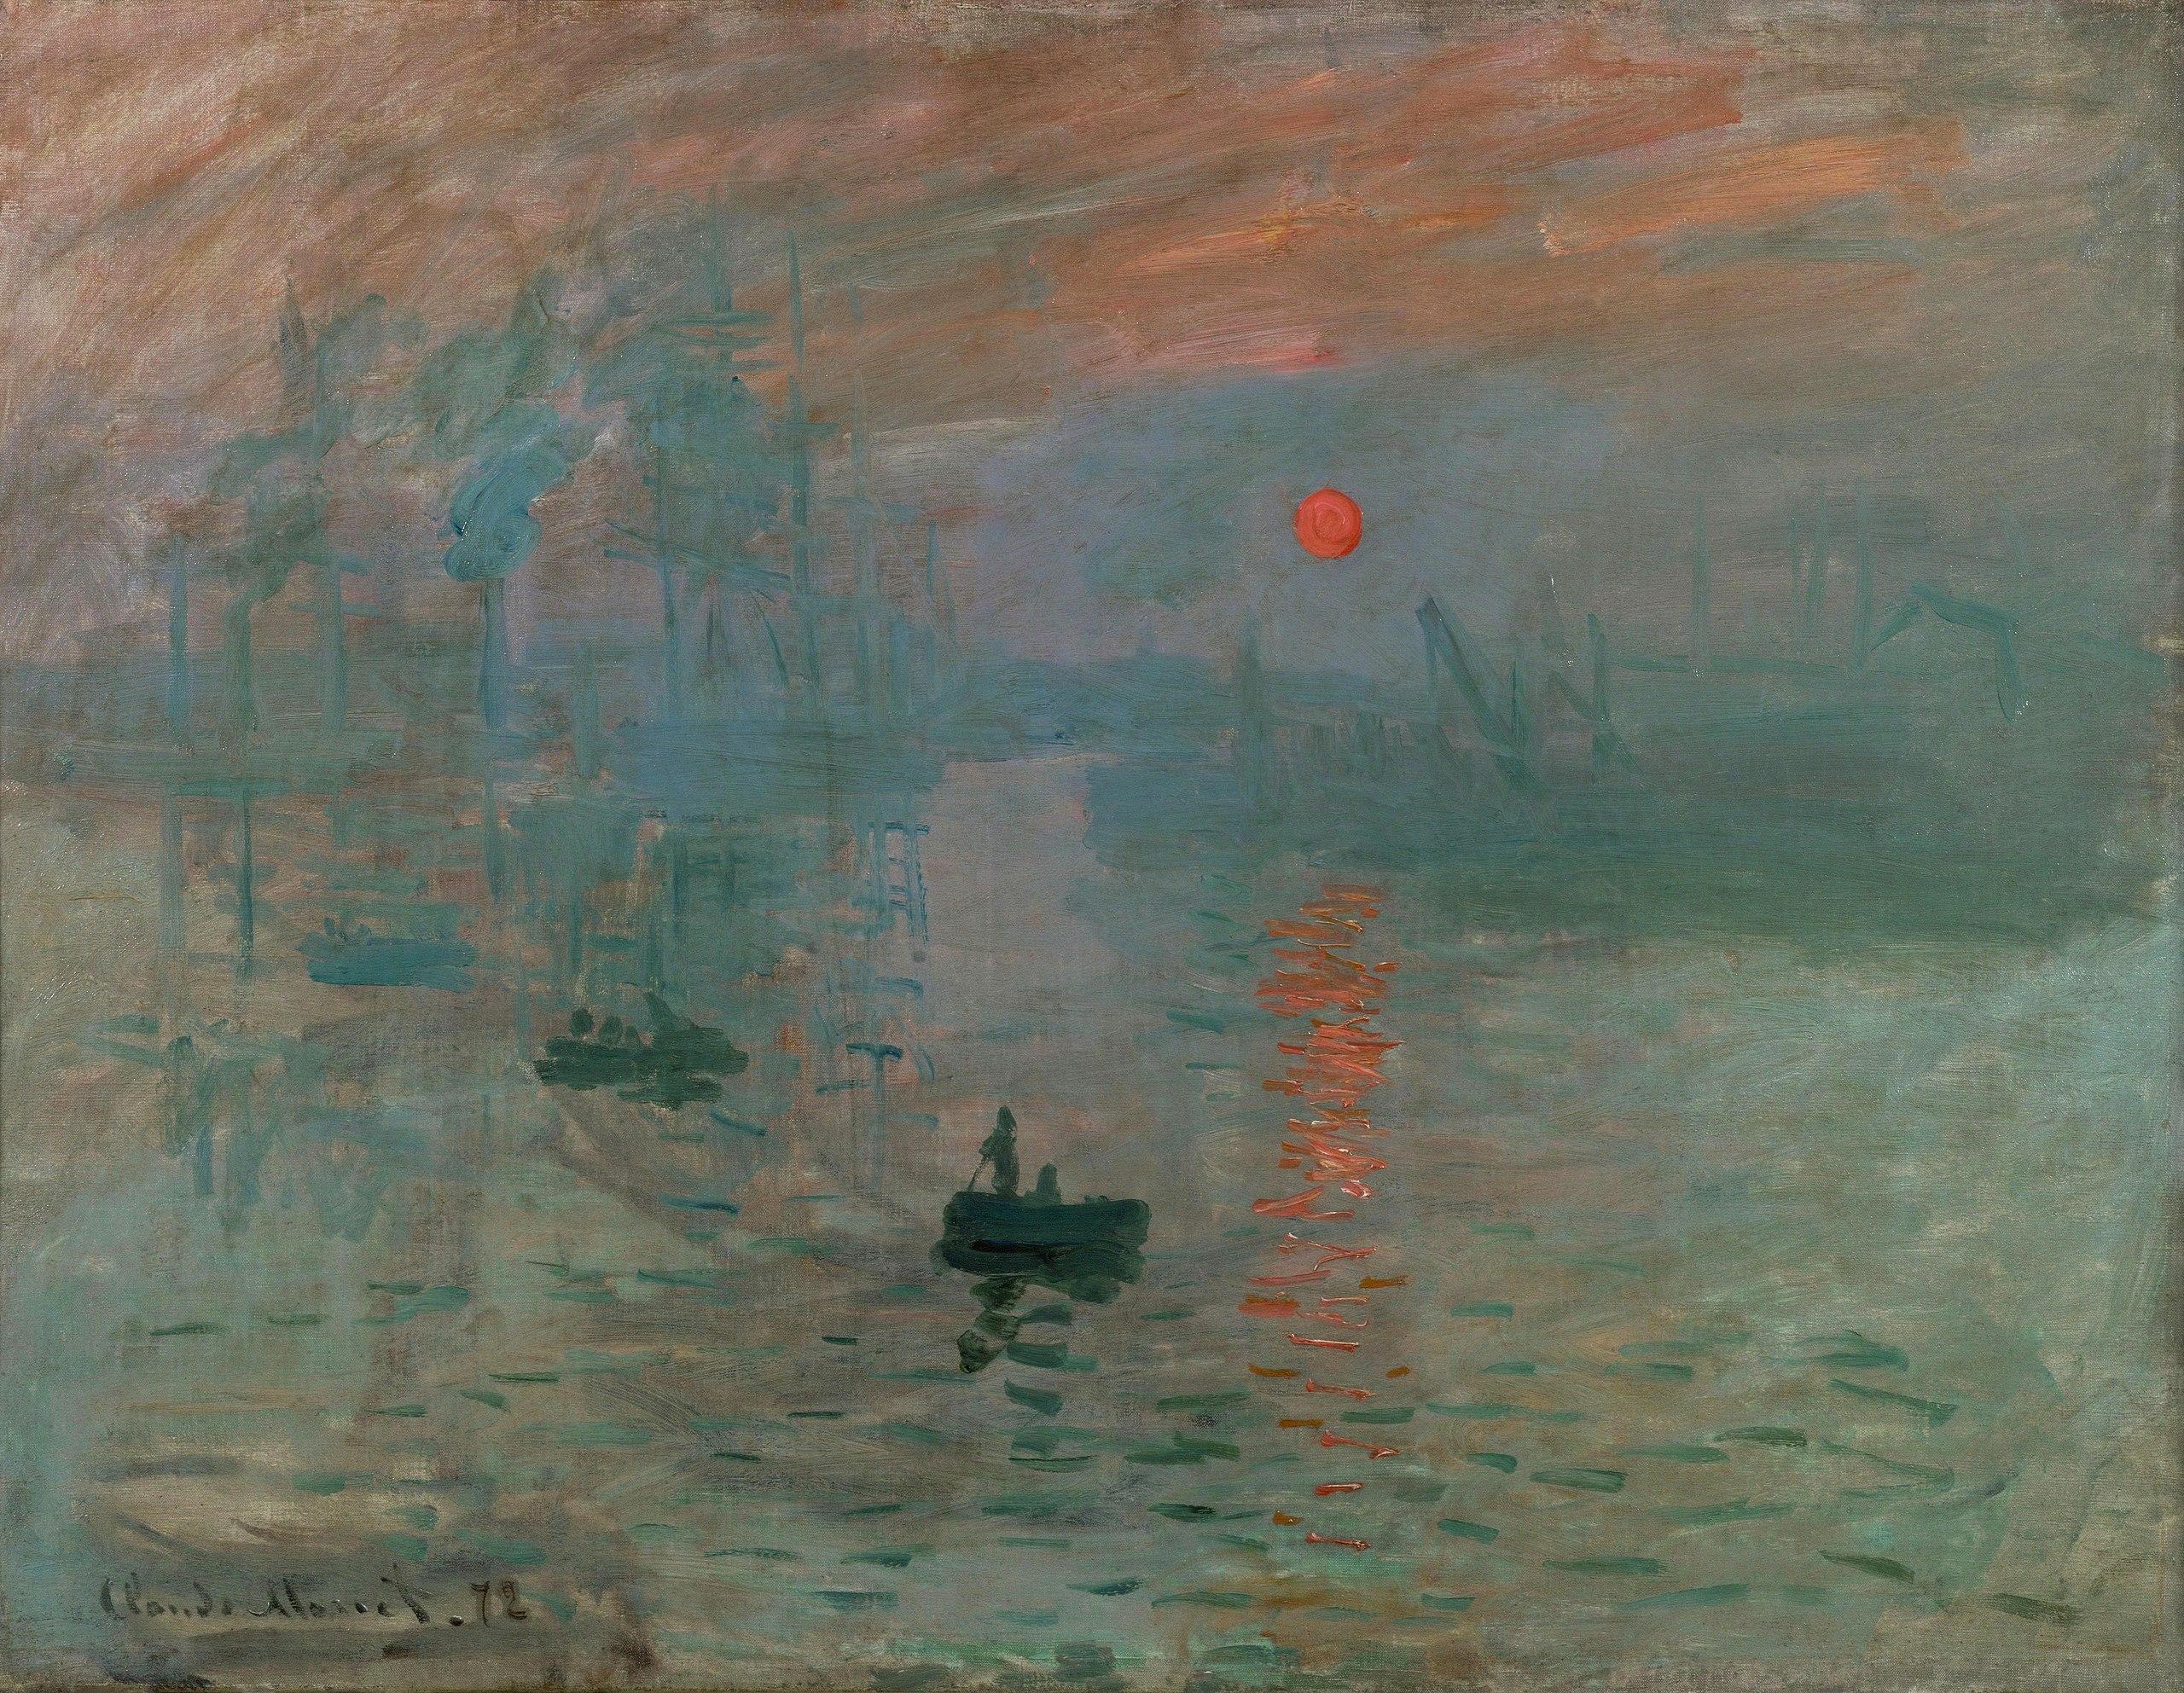 12. Impressione, levar del sole – Claude Monet (1872) - Musée Marmottan Monet, Parigi